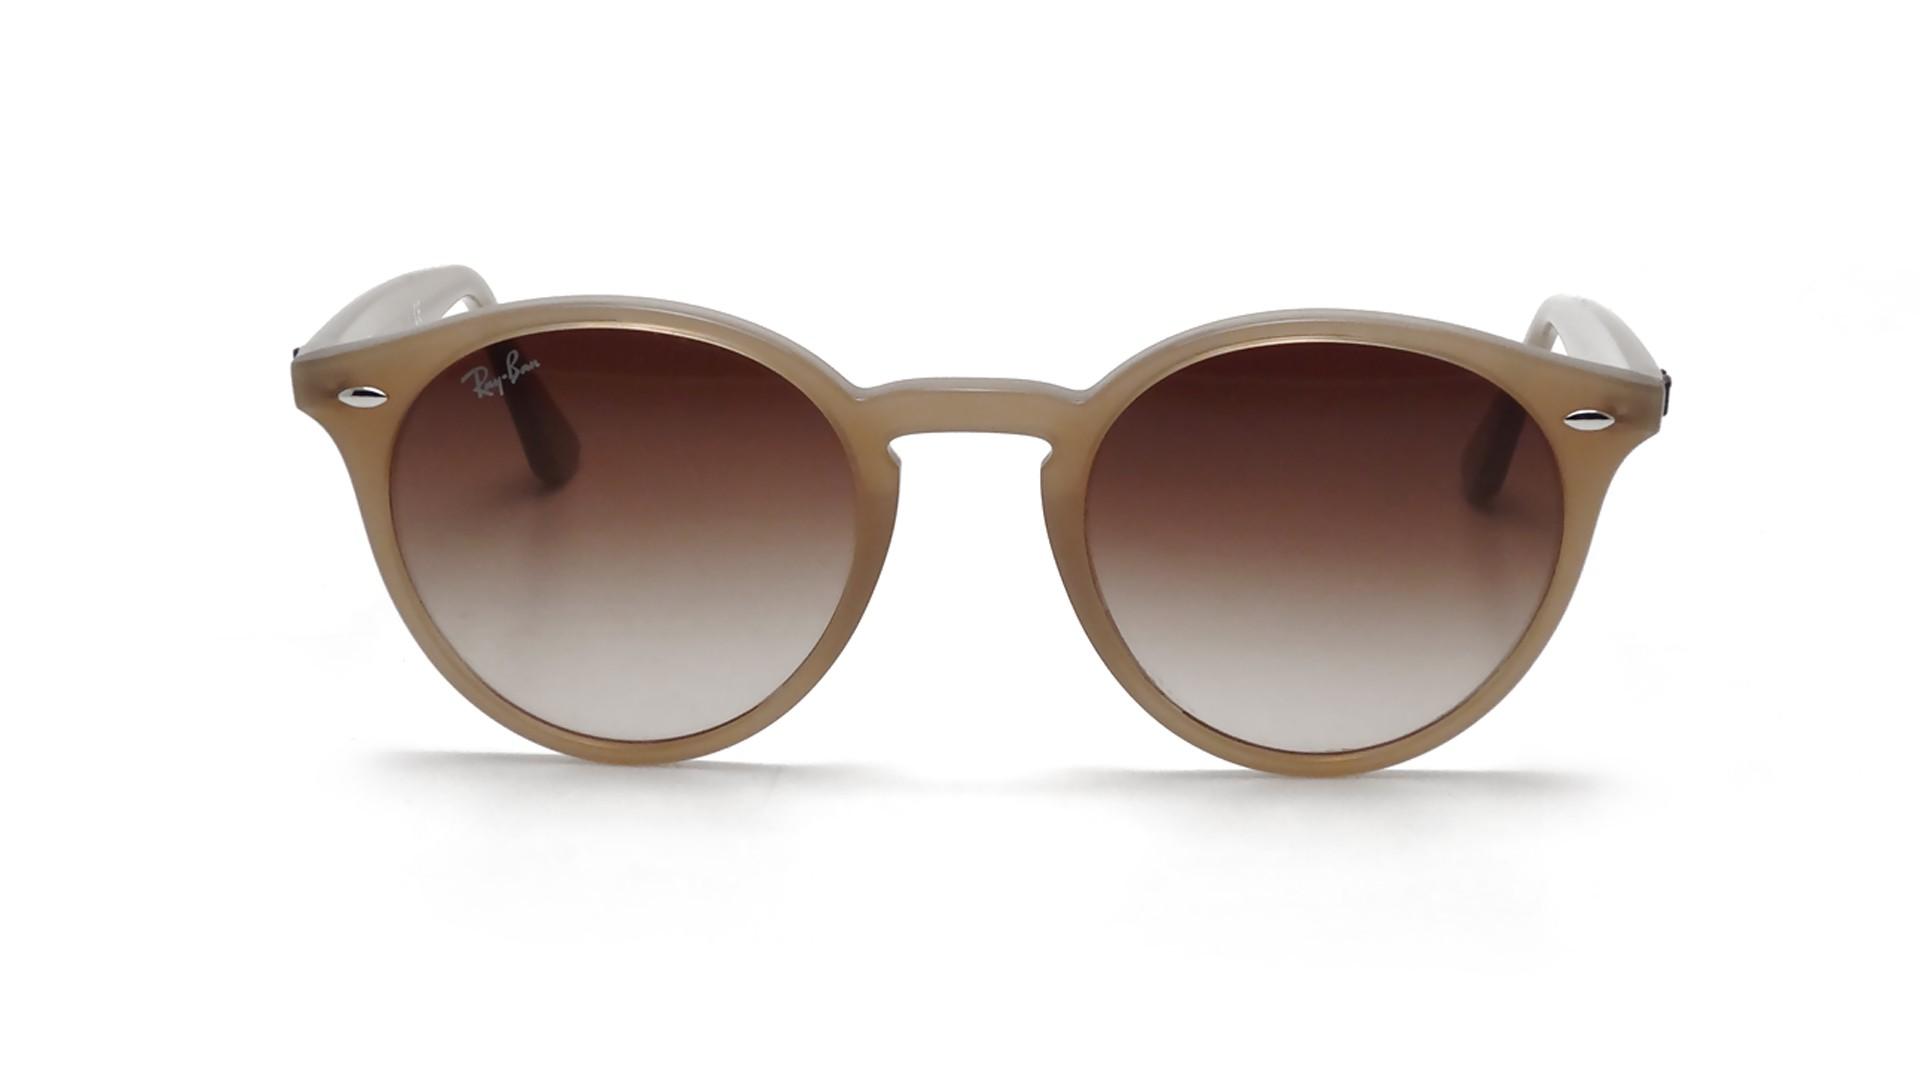 d49f7390960 Sunglasses Ray-Ban RB2180 6166 13 49-21 Beige Medium Gradient